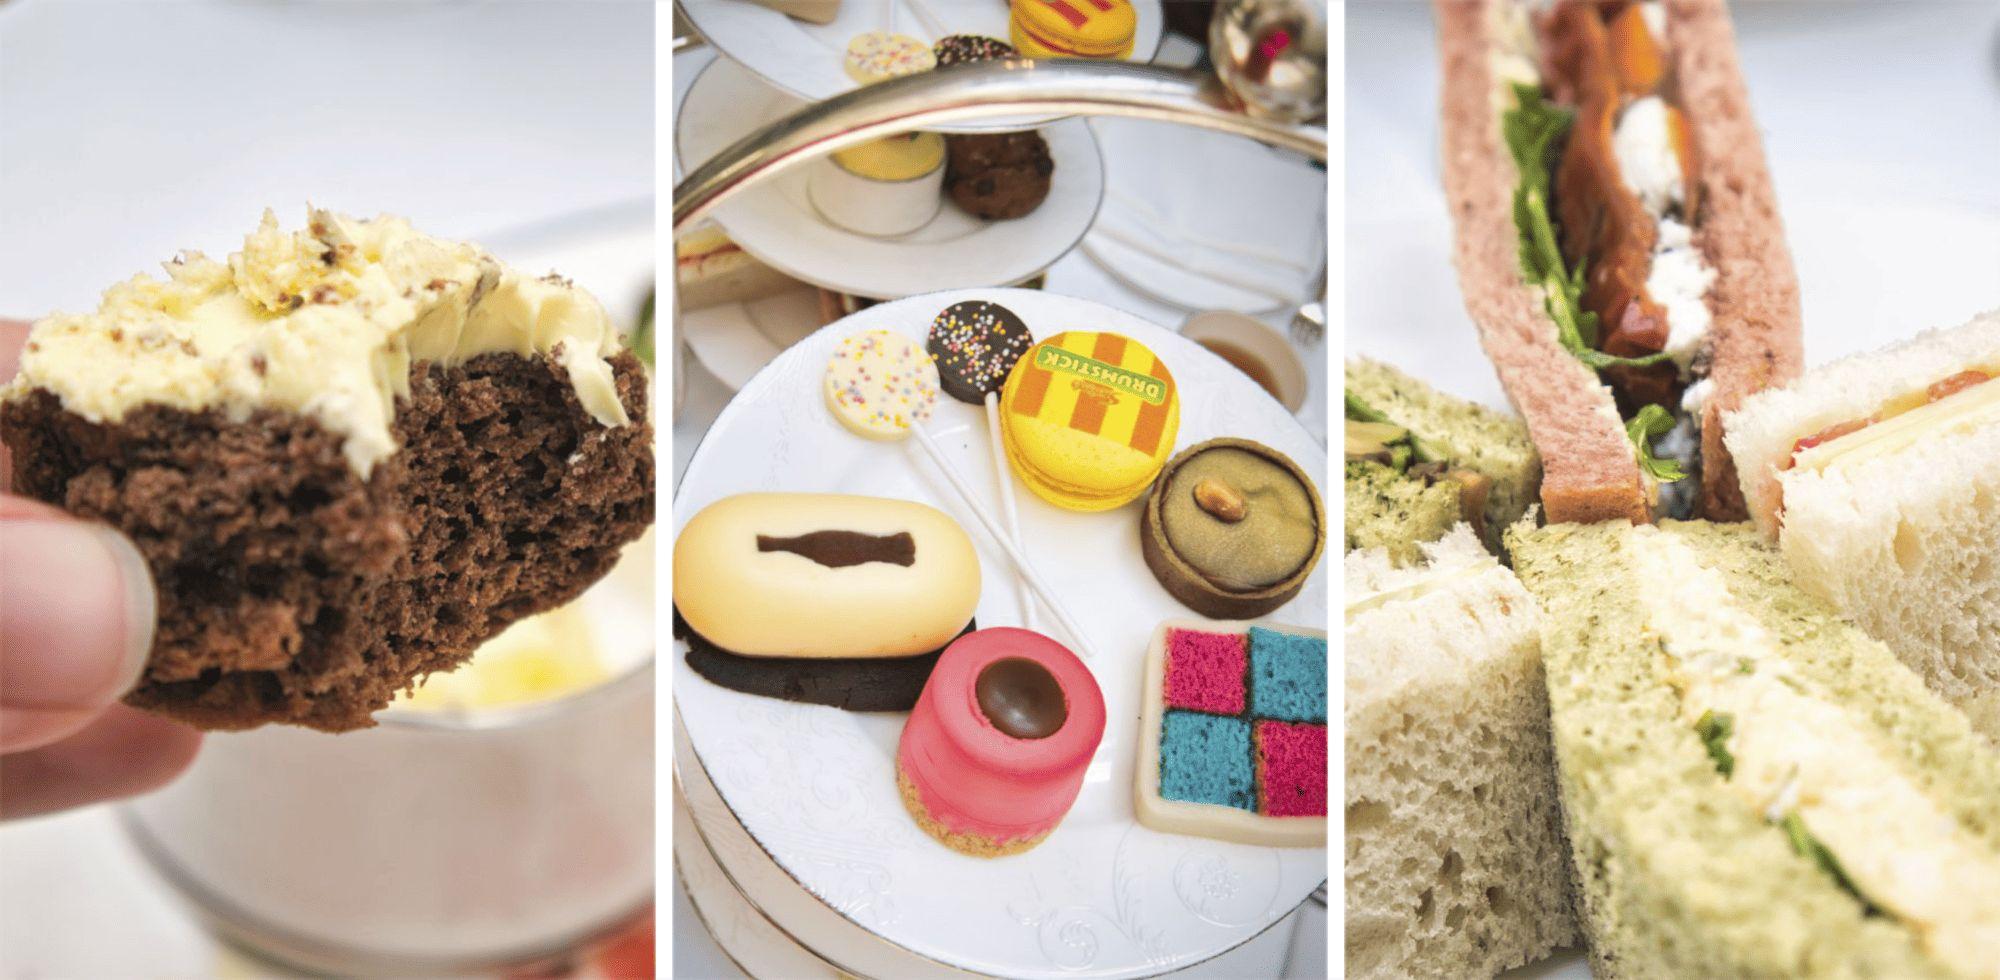 Chesterfield Mayfair Afternoon Tea Review (+ Photos!) via @girlsgonelondon